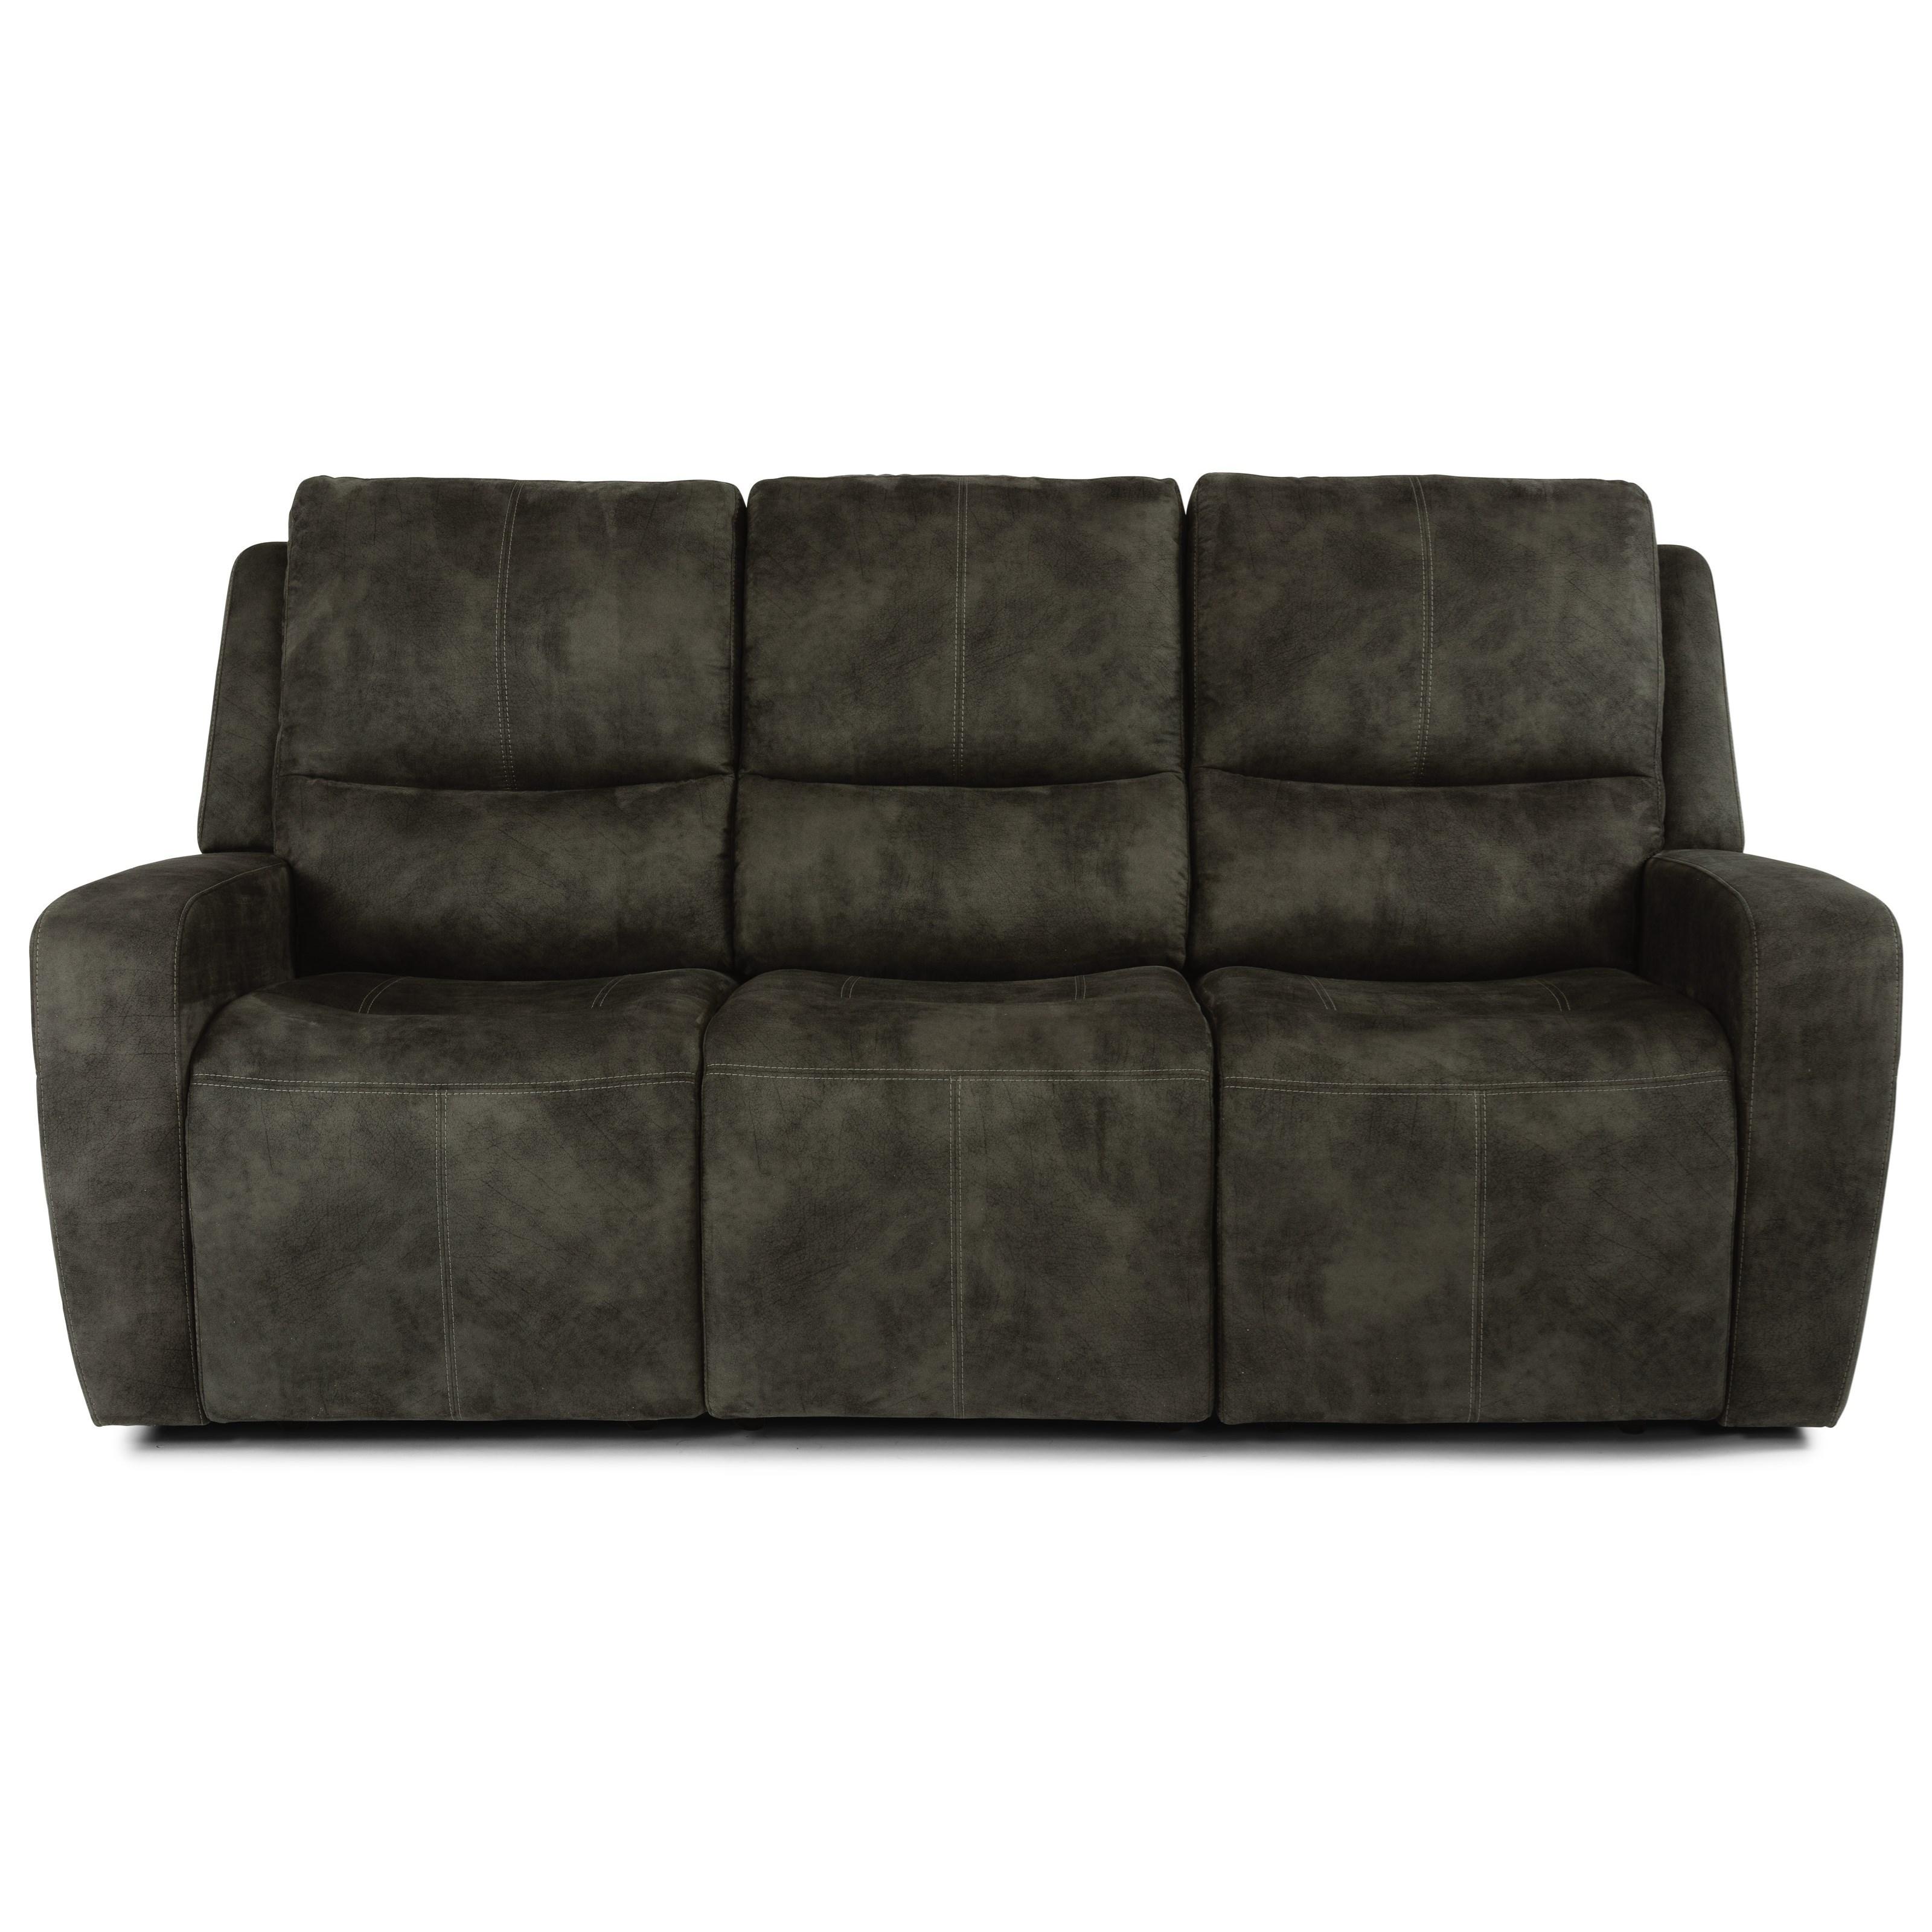 Latitudes - Aiden Power Reclining Sofa by Flexsteel at Mueller Furniture